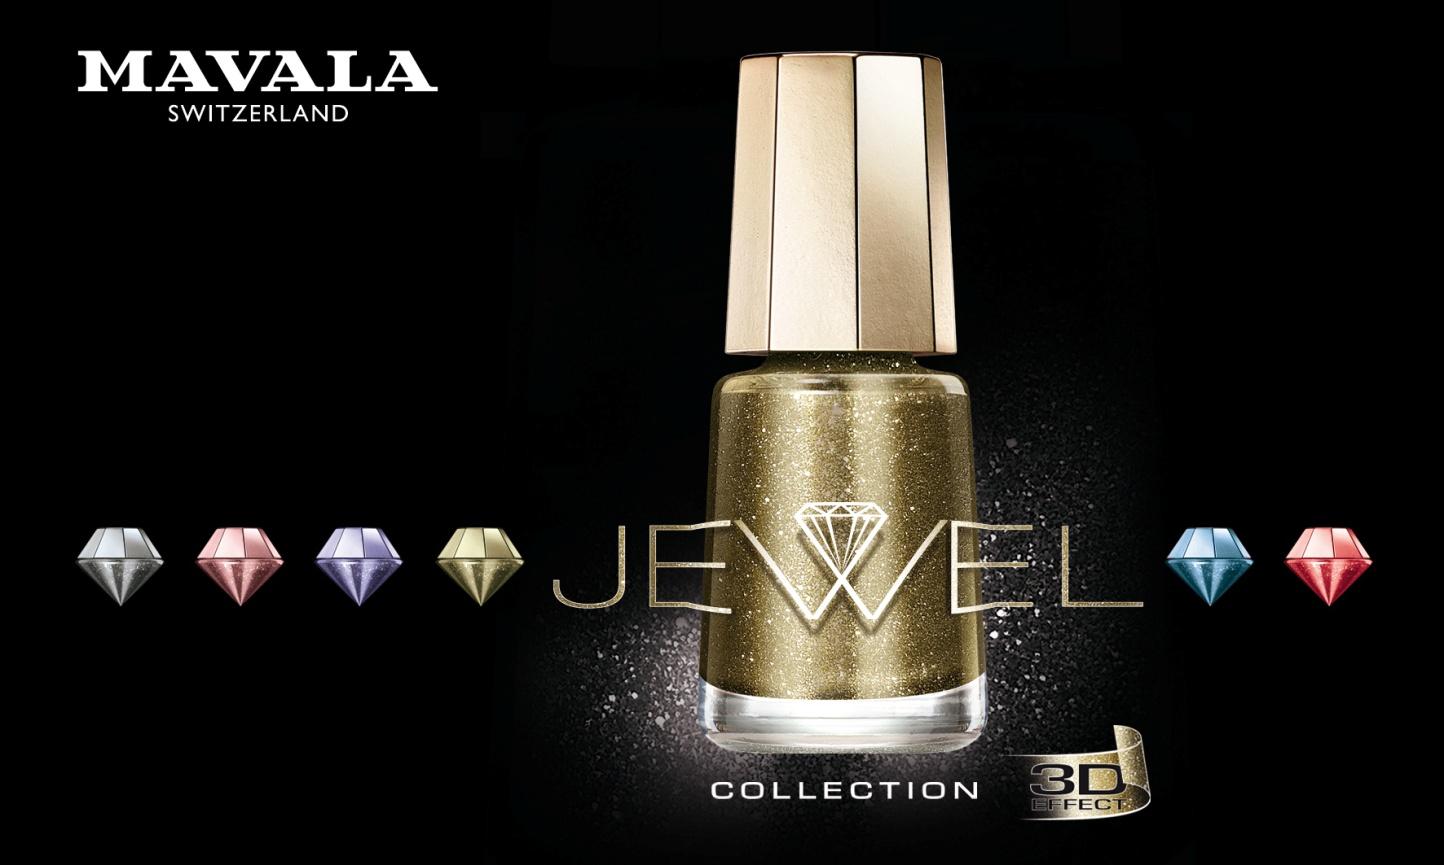 392 Moonstone JEWEL Collection by MAVALA